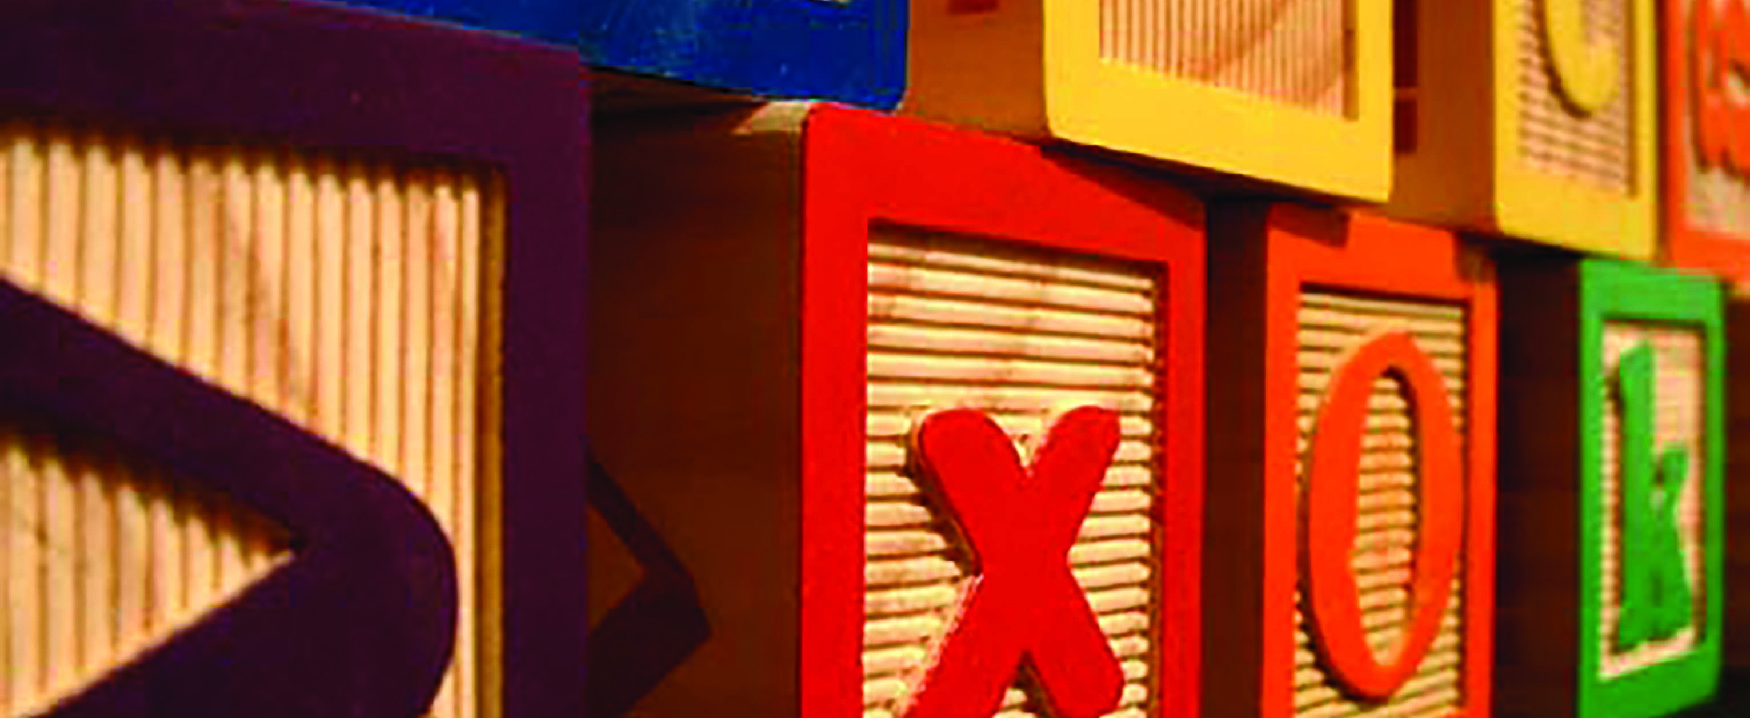 Photograph of children's toy blocks.